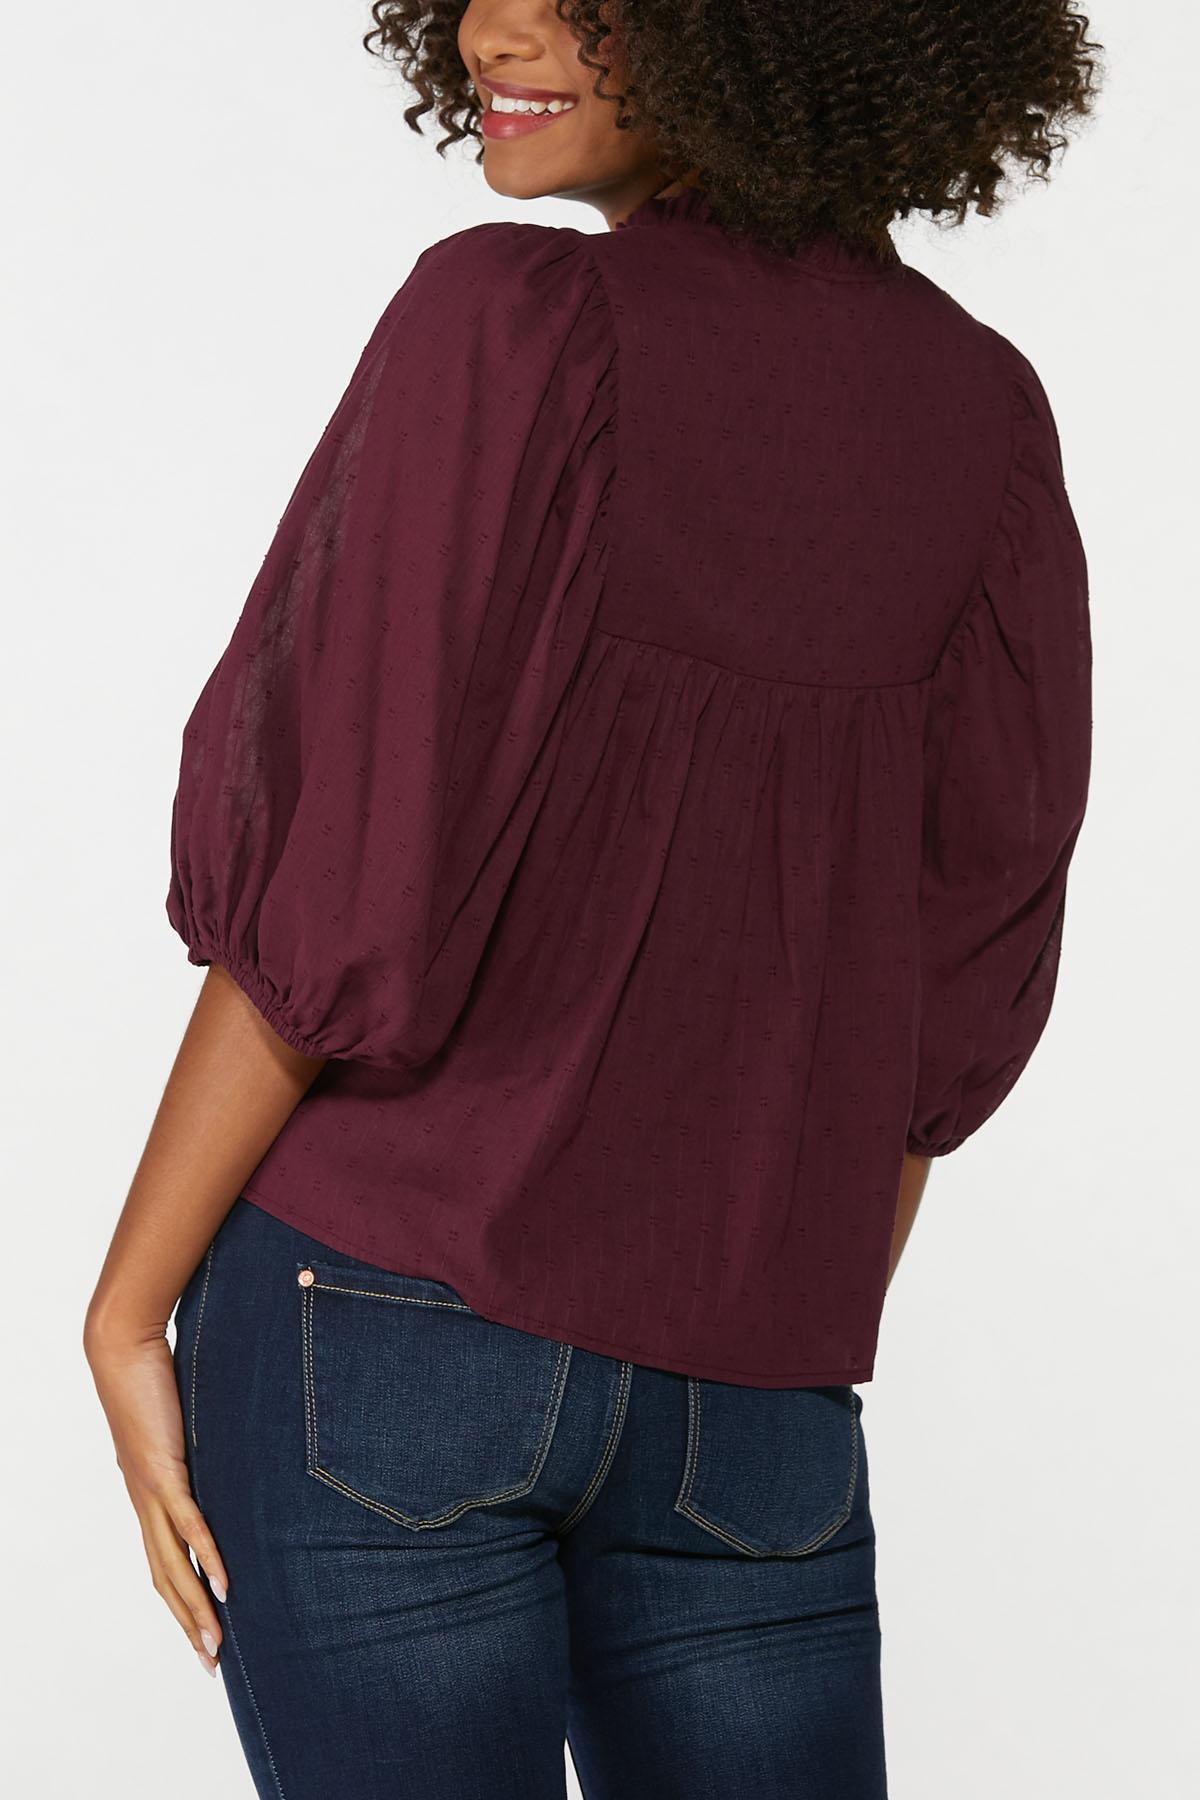 Plus Size Wine Balloon Sleeve Top (Item #44643903)